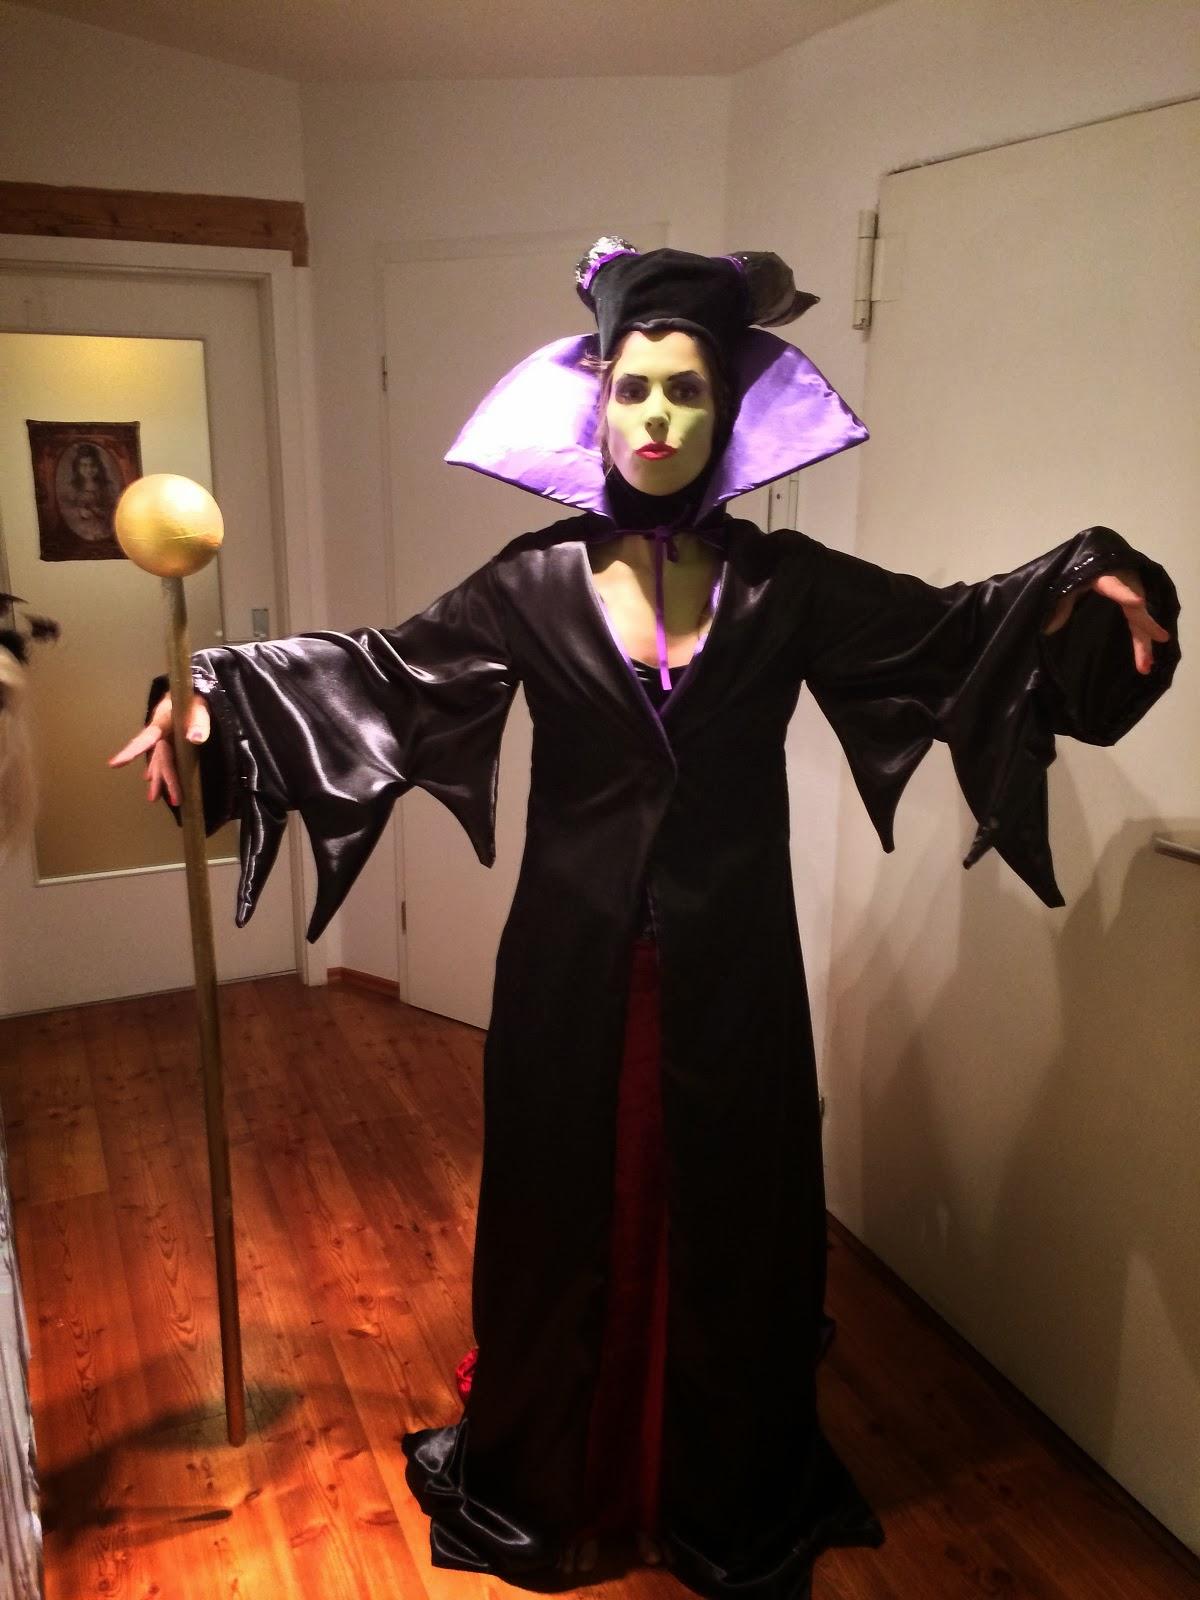 Welcome to my Halloween